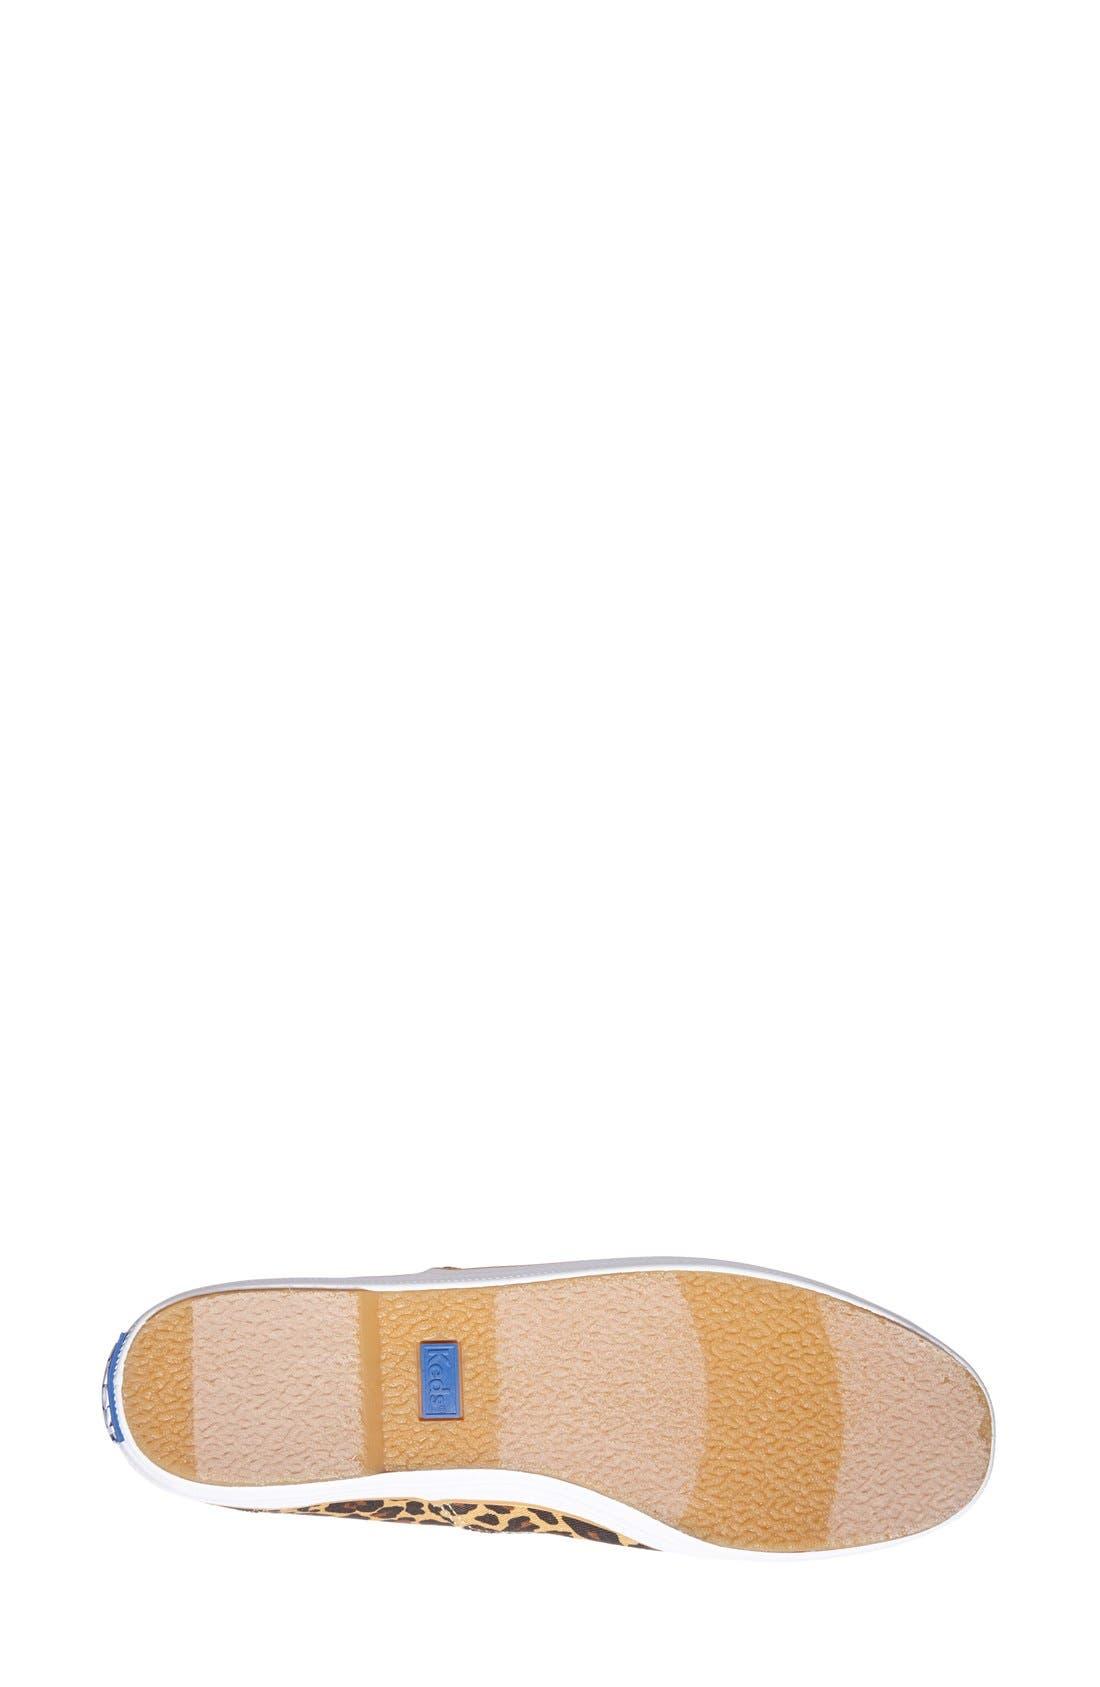 KEDS<SUP>®</SUP>,                             'Champion' Leopard Print Sneaker,                             Alternate thumbnail 3, color,                             230